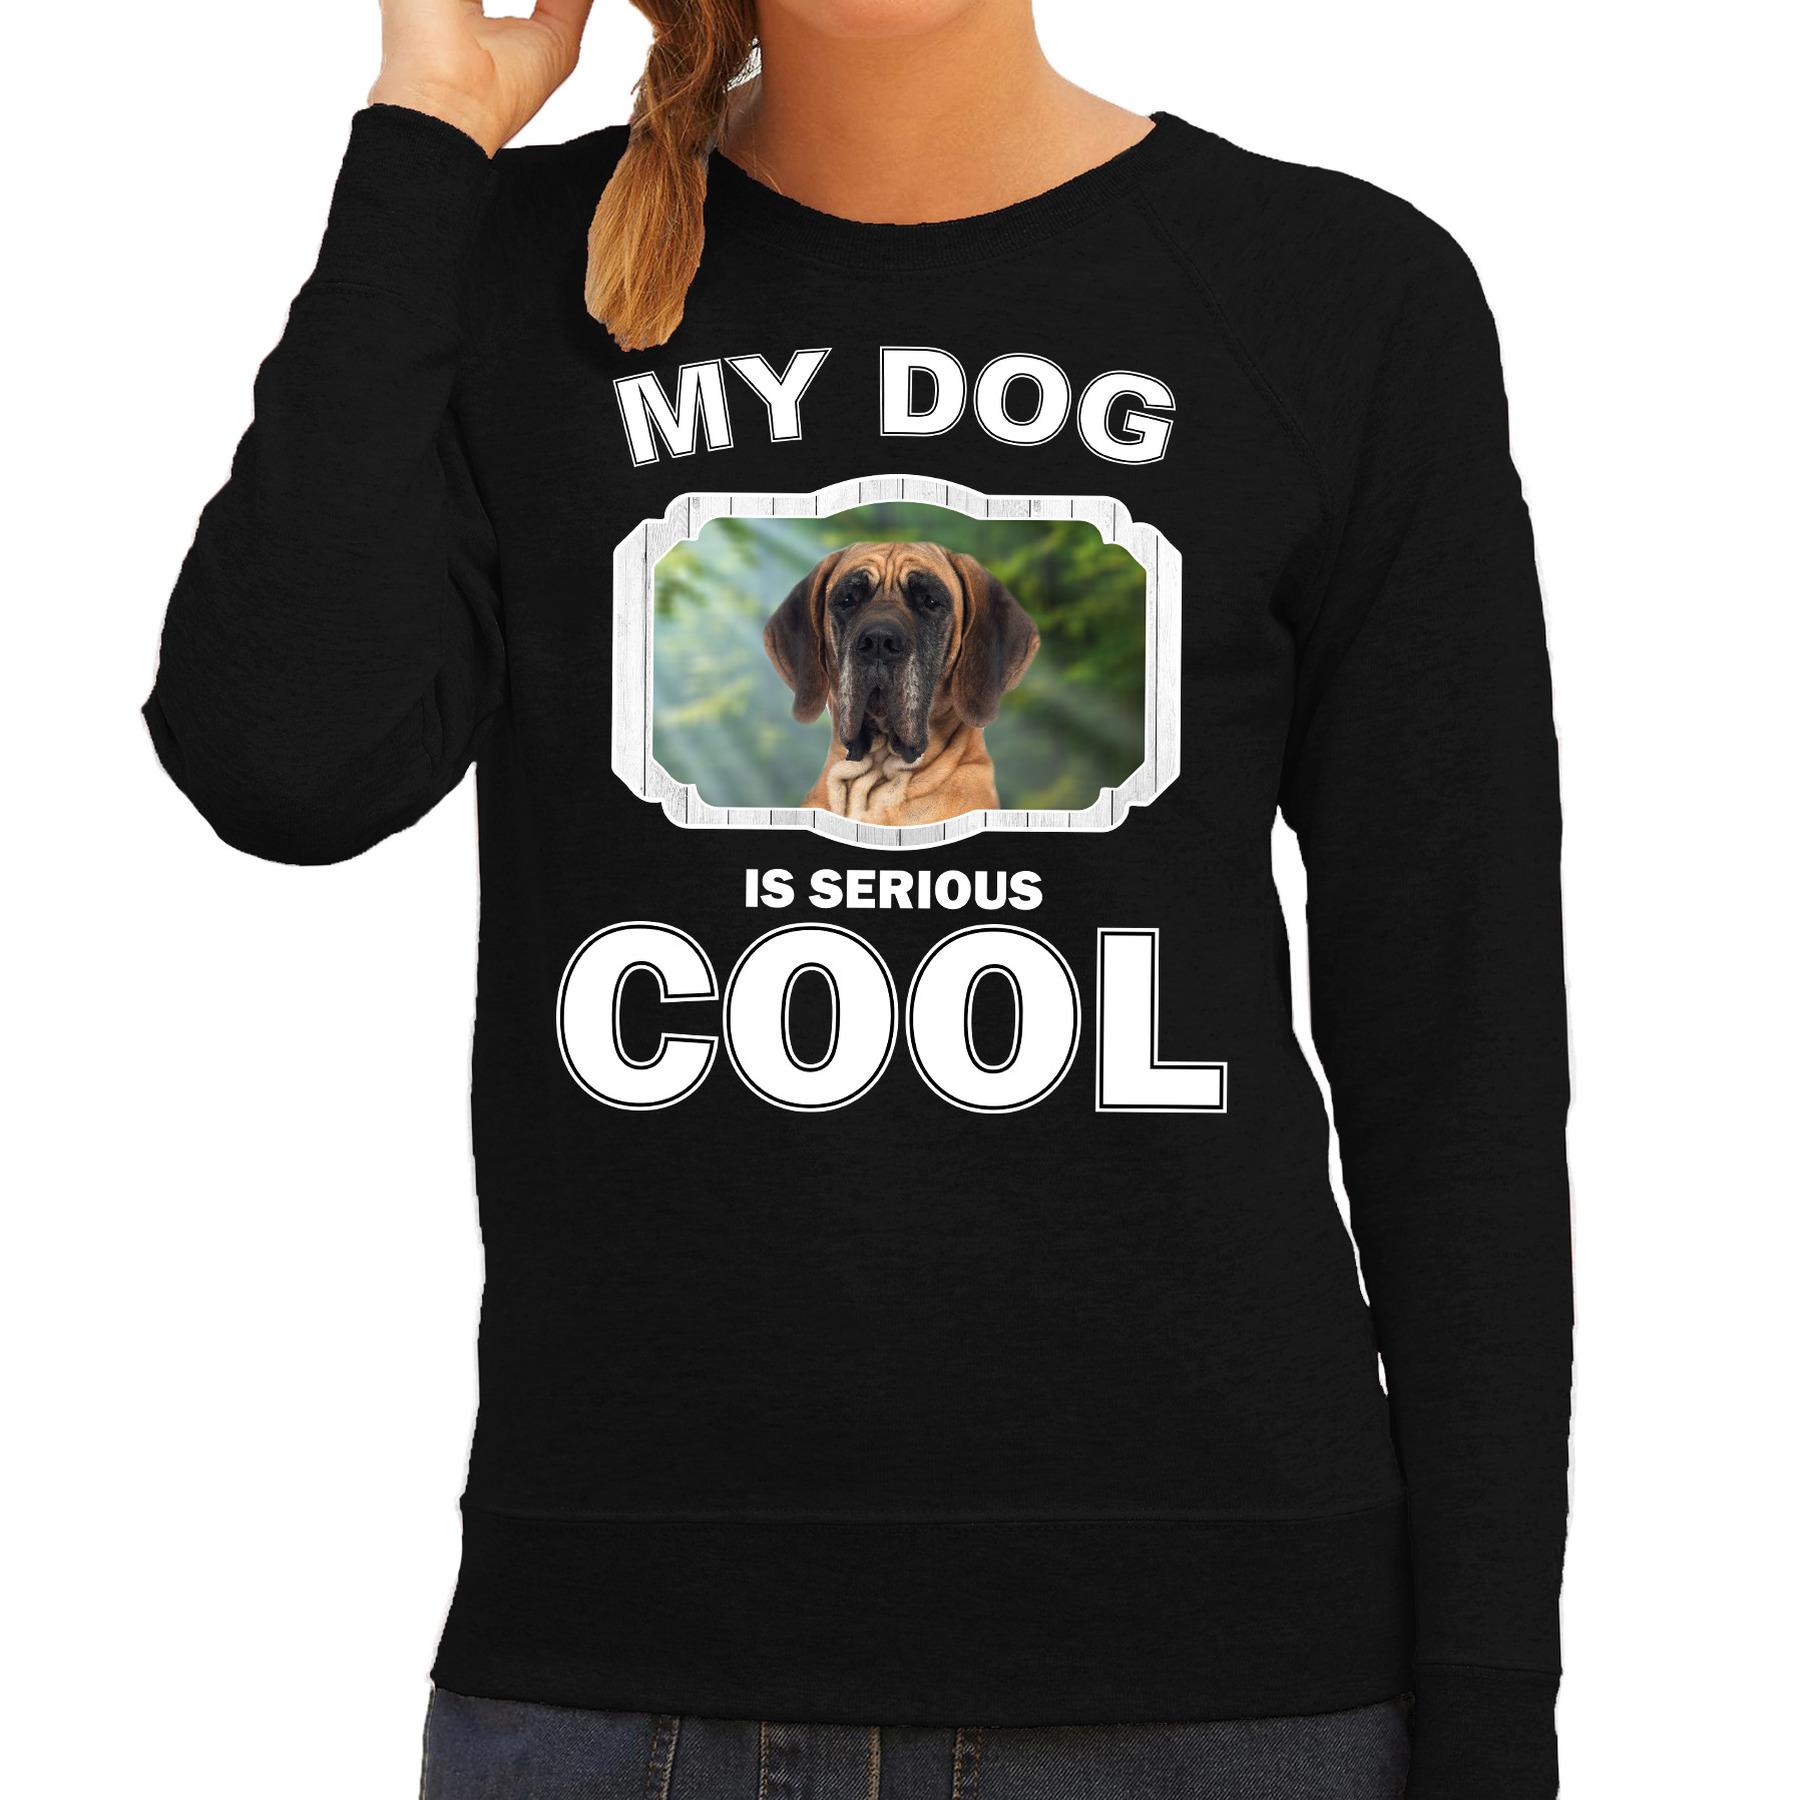 Honden liefhebber trui / sweater Deense dog my dog is serious cool zwart voor dames